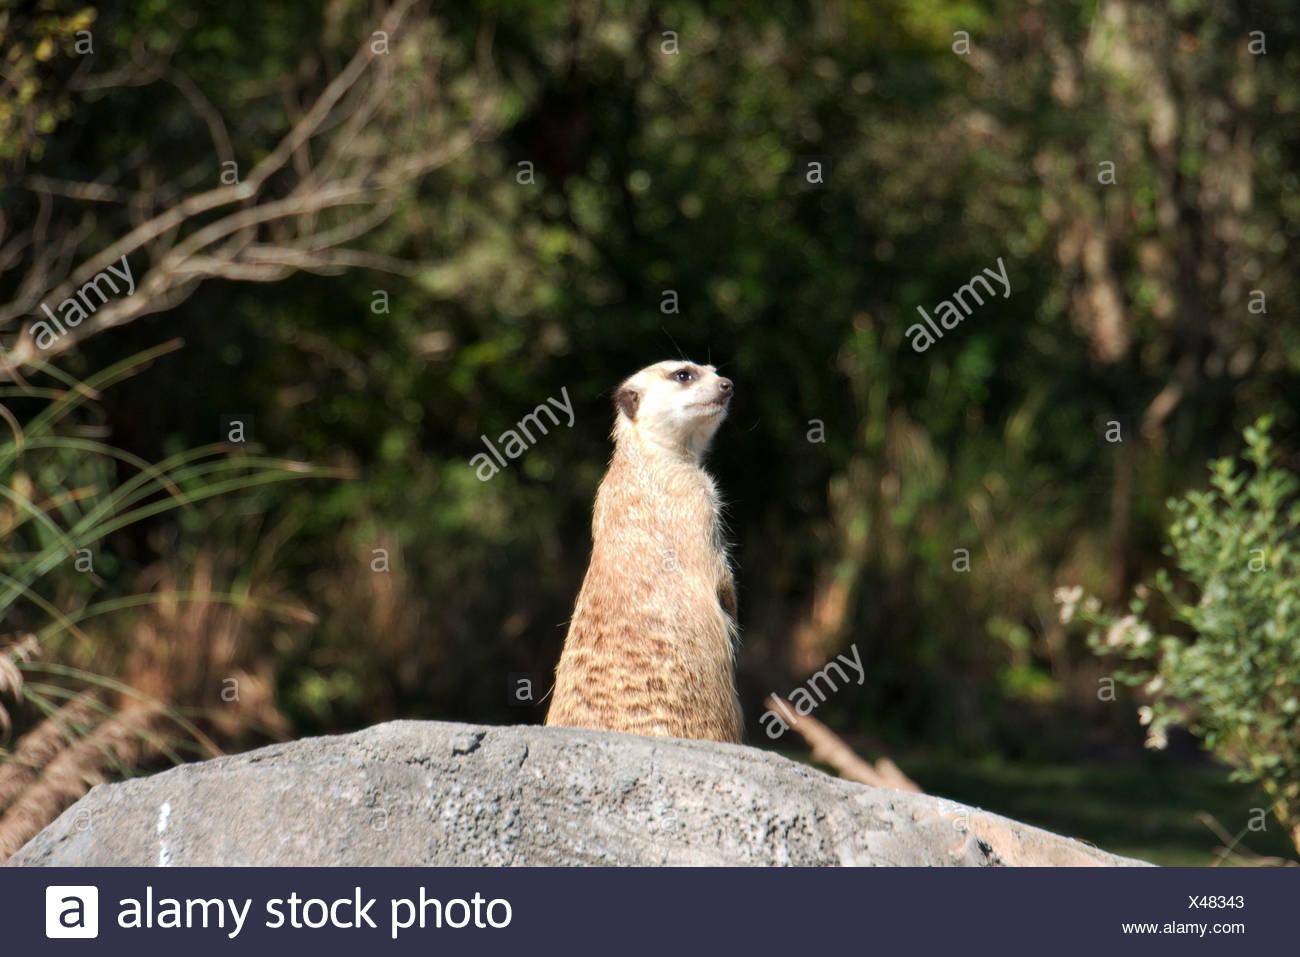 animal mammal guard wildlife maddening pert coquettish cute meerkat meerkats - Stock Image